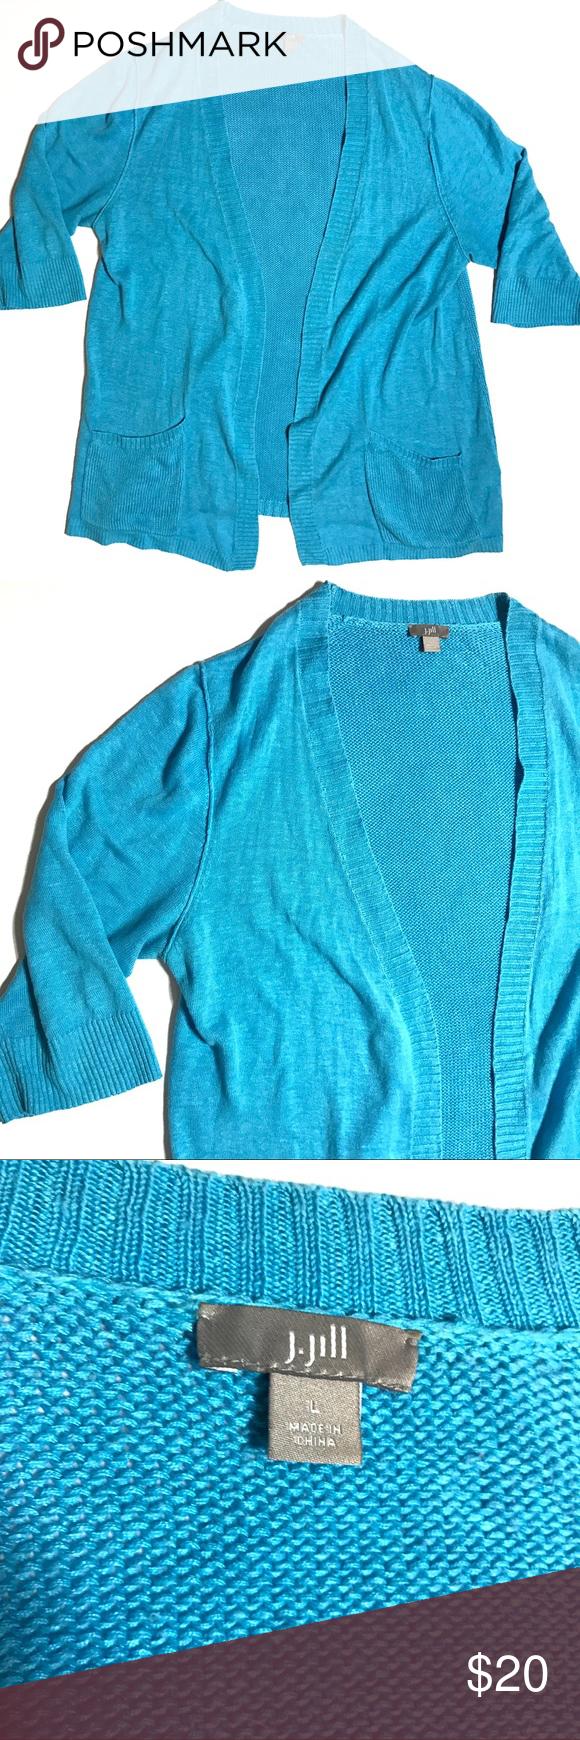 J Jill Blue Open Front Linen Cardigan Sweater L J Jill Light Blue ...